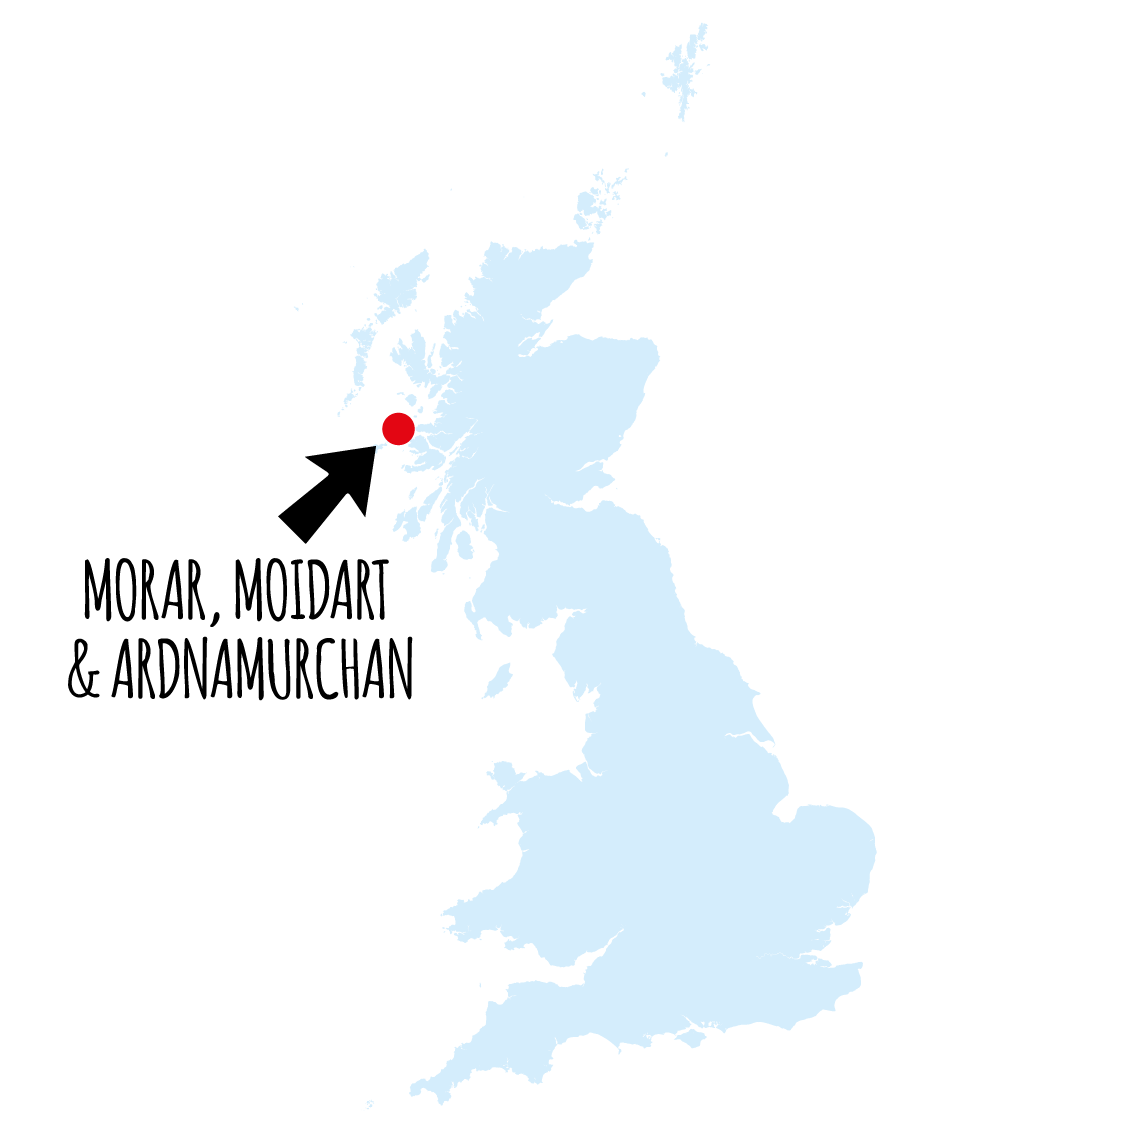 morar-moidart-ardnamurchan-map.png